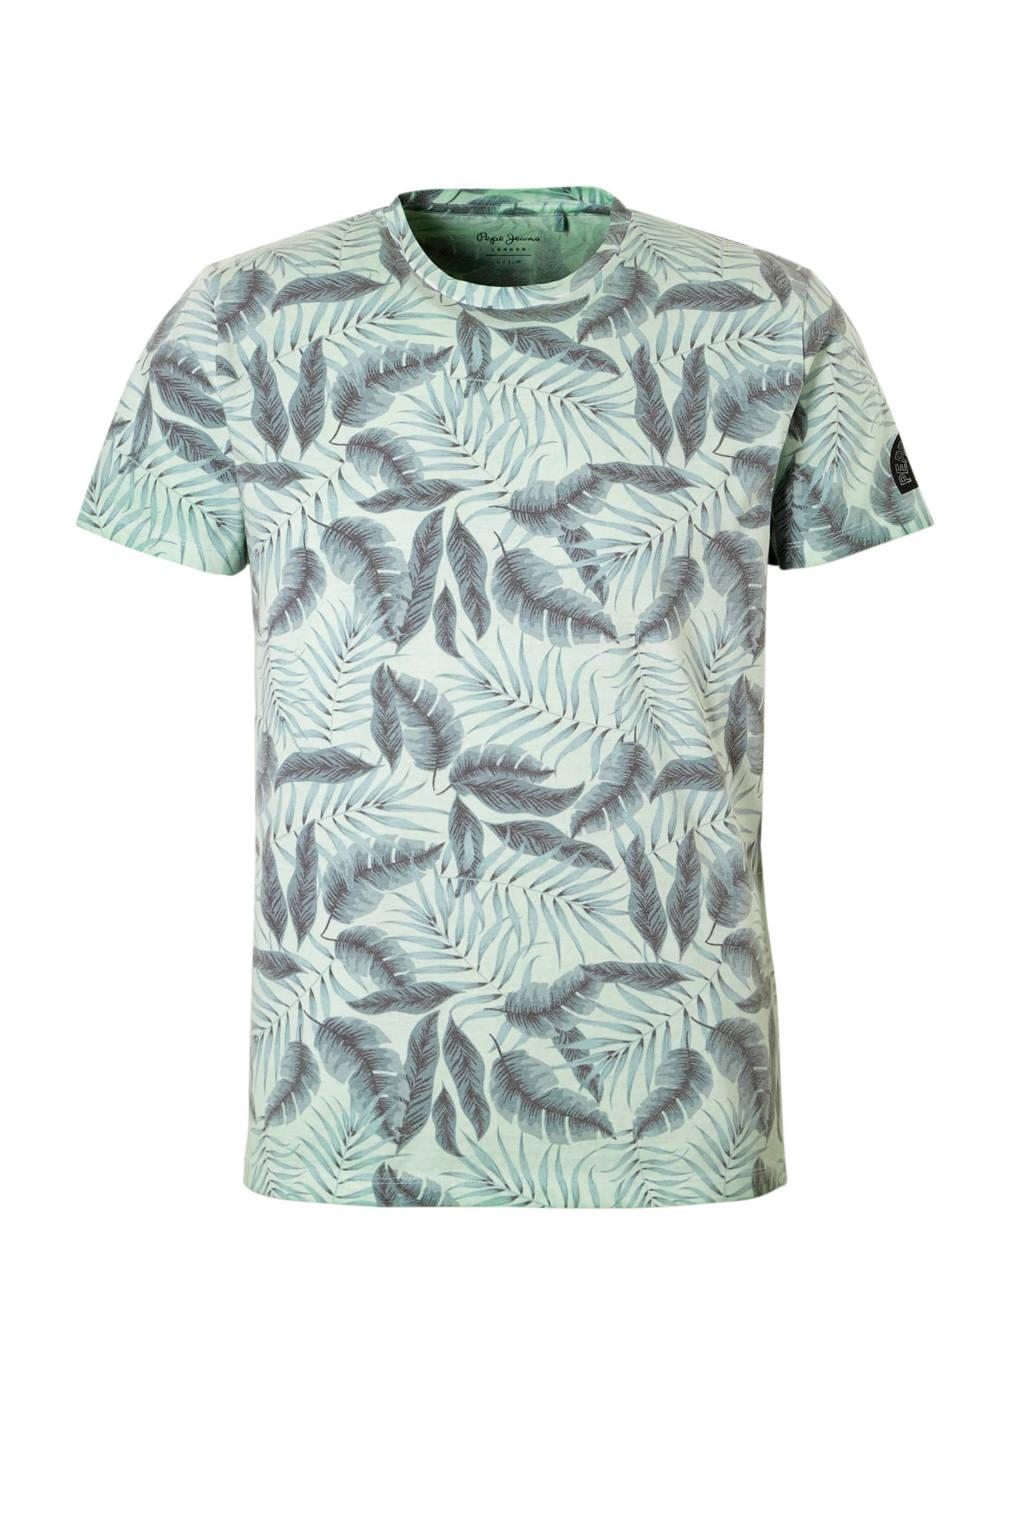 Pepe Jeans T-shirt met printopdruk groen, Groen